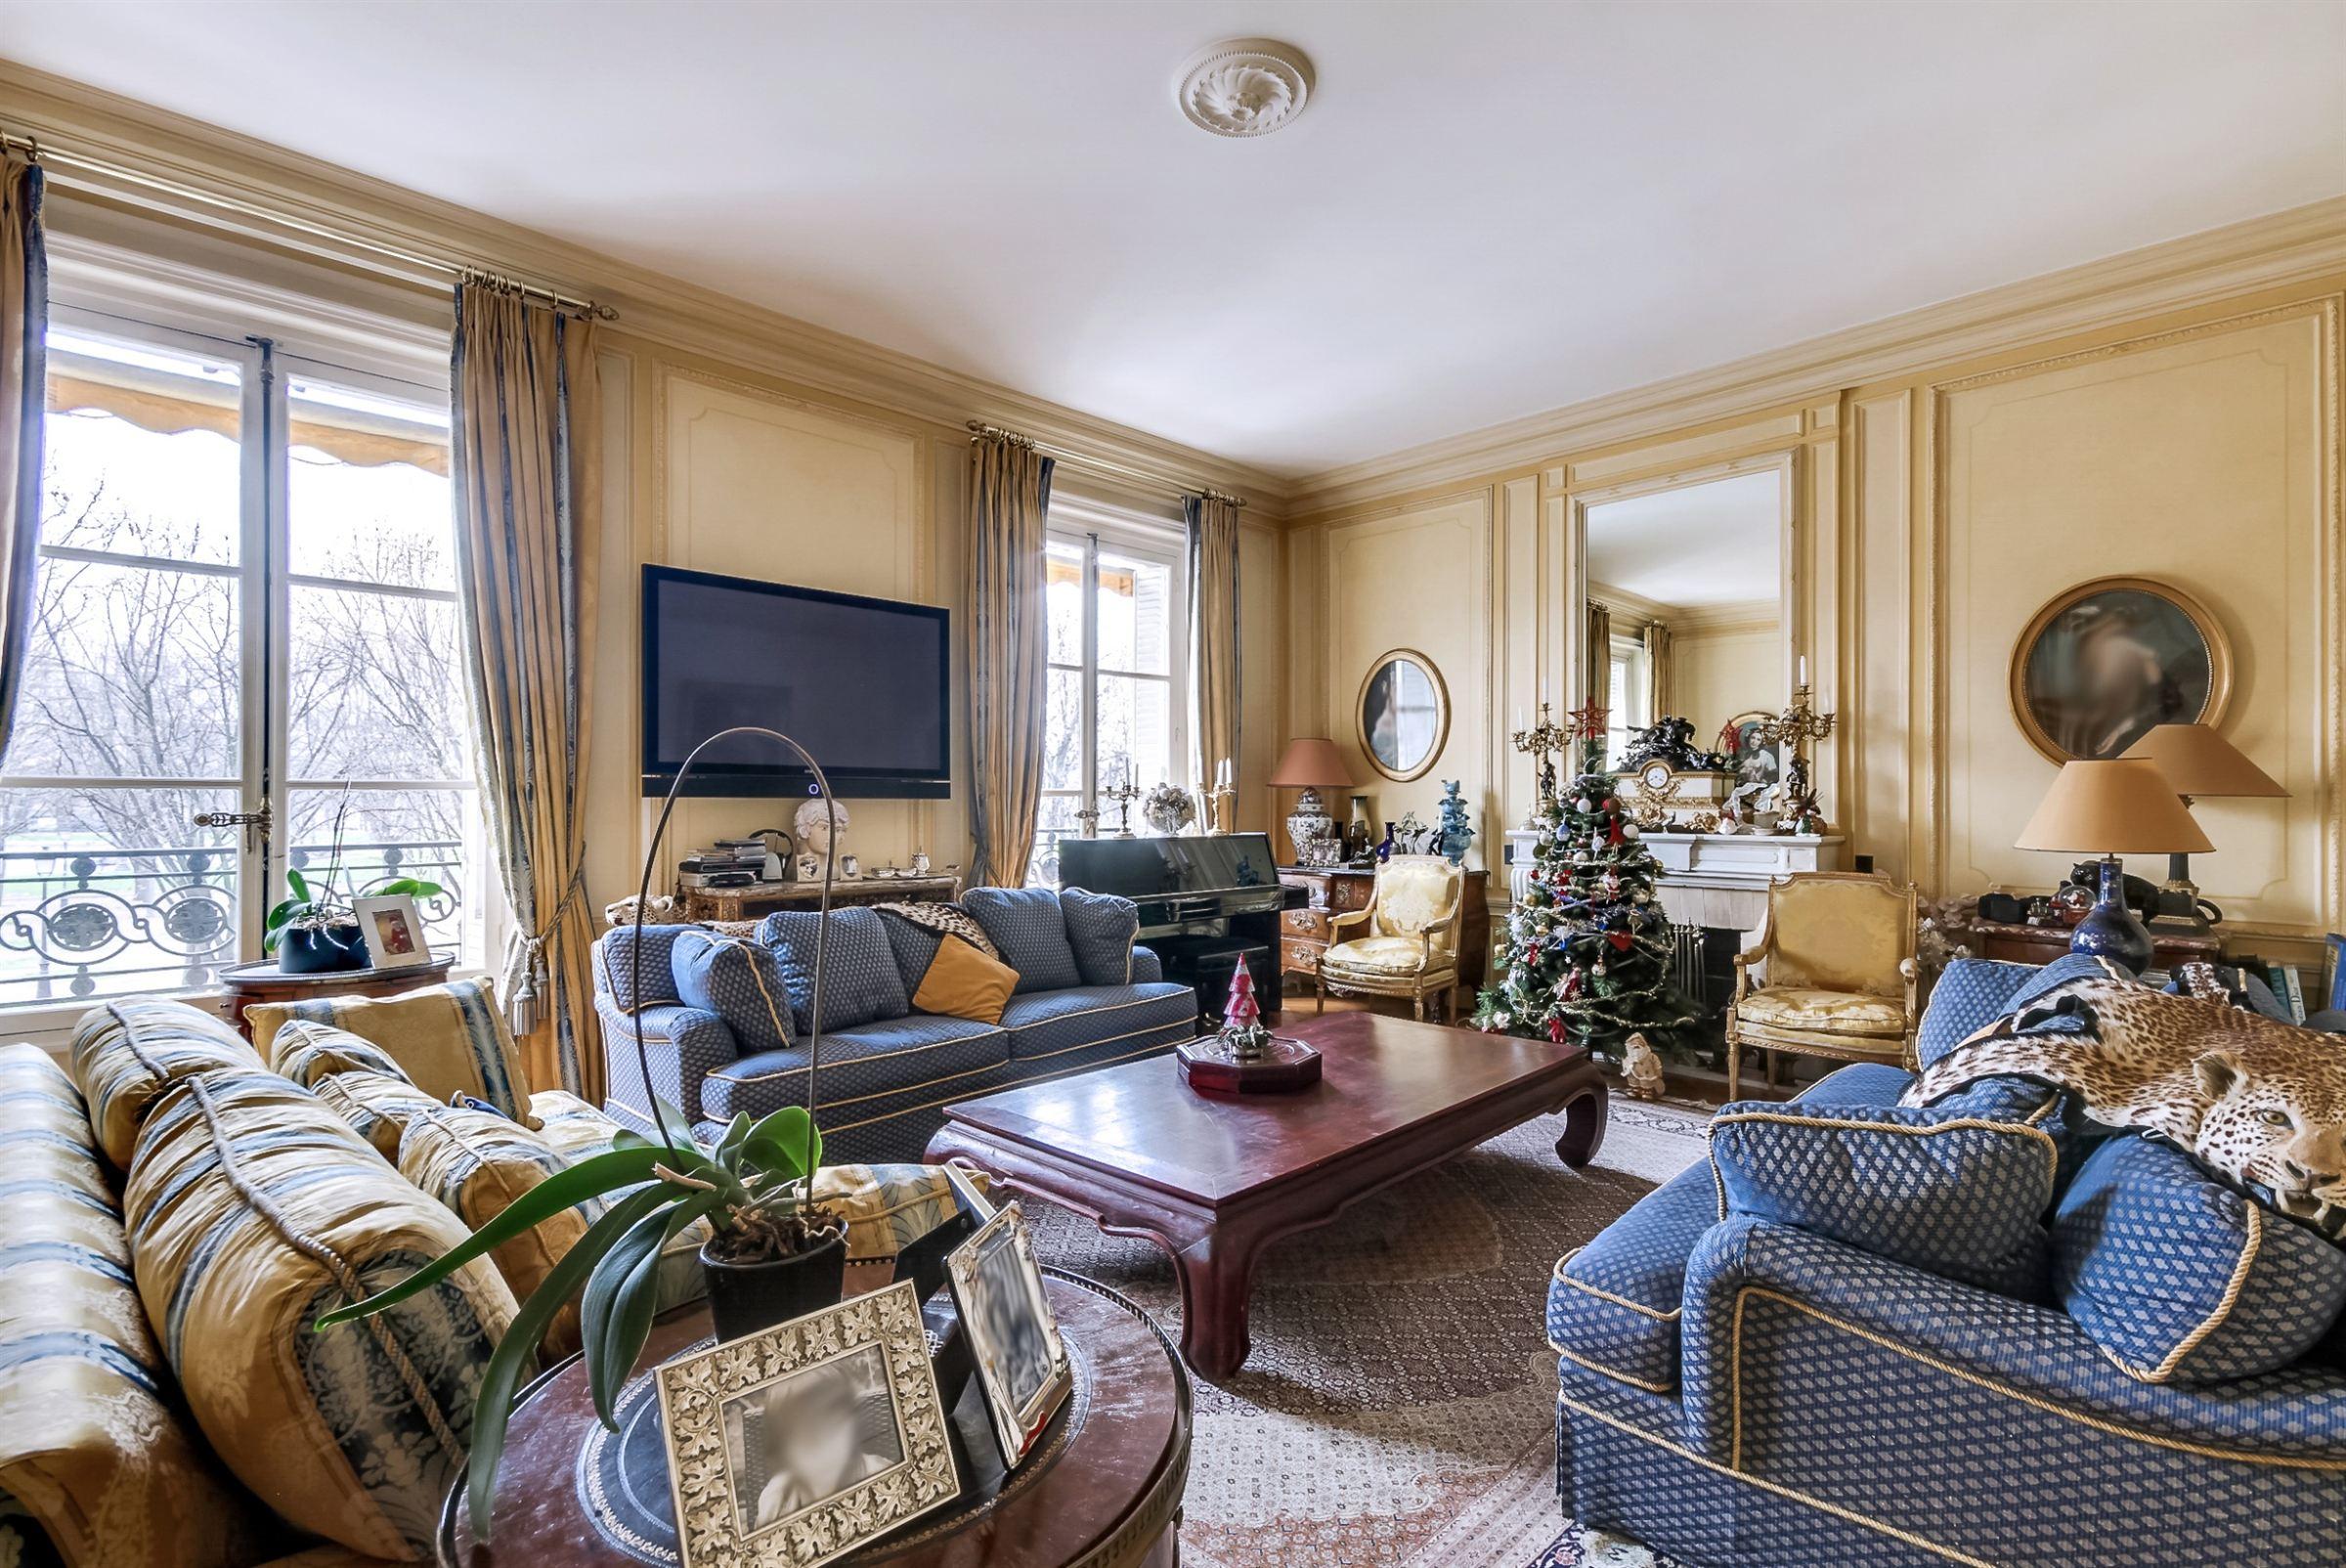 sales property at On sale superb through apartment Paris 7 Invalides